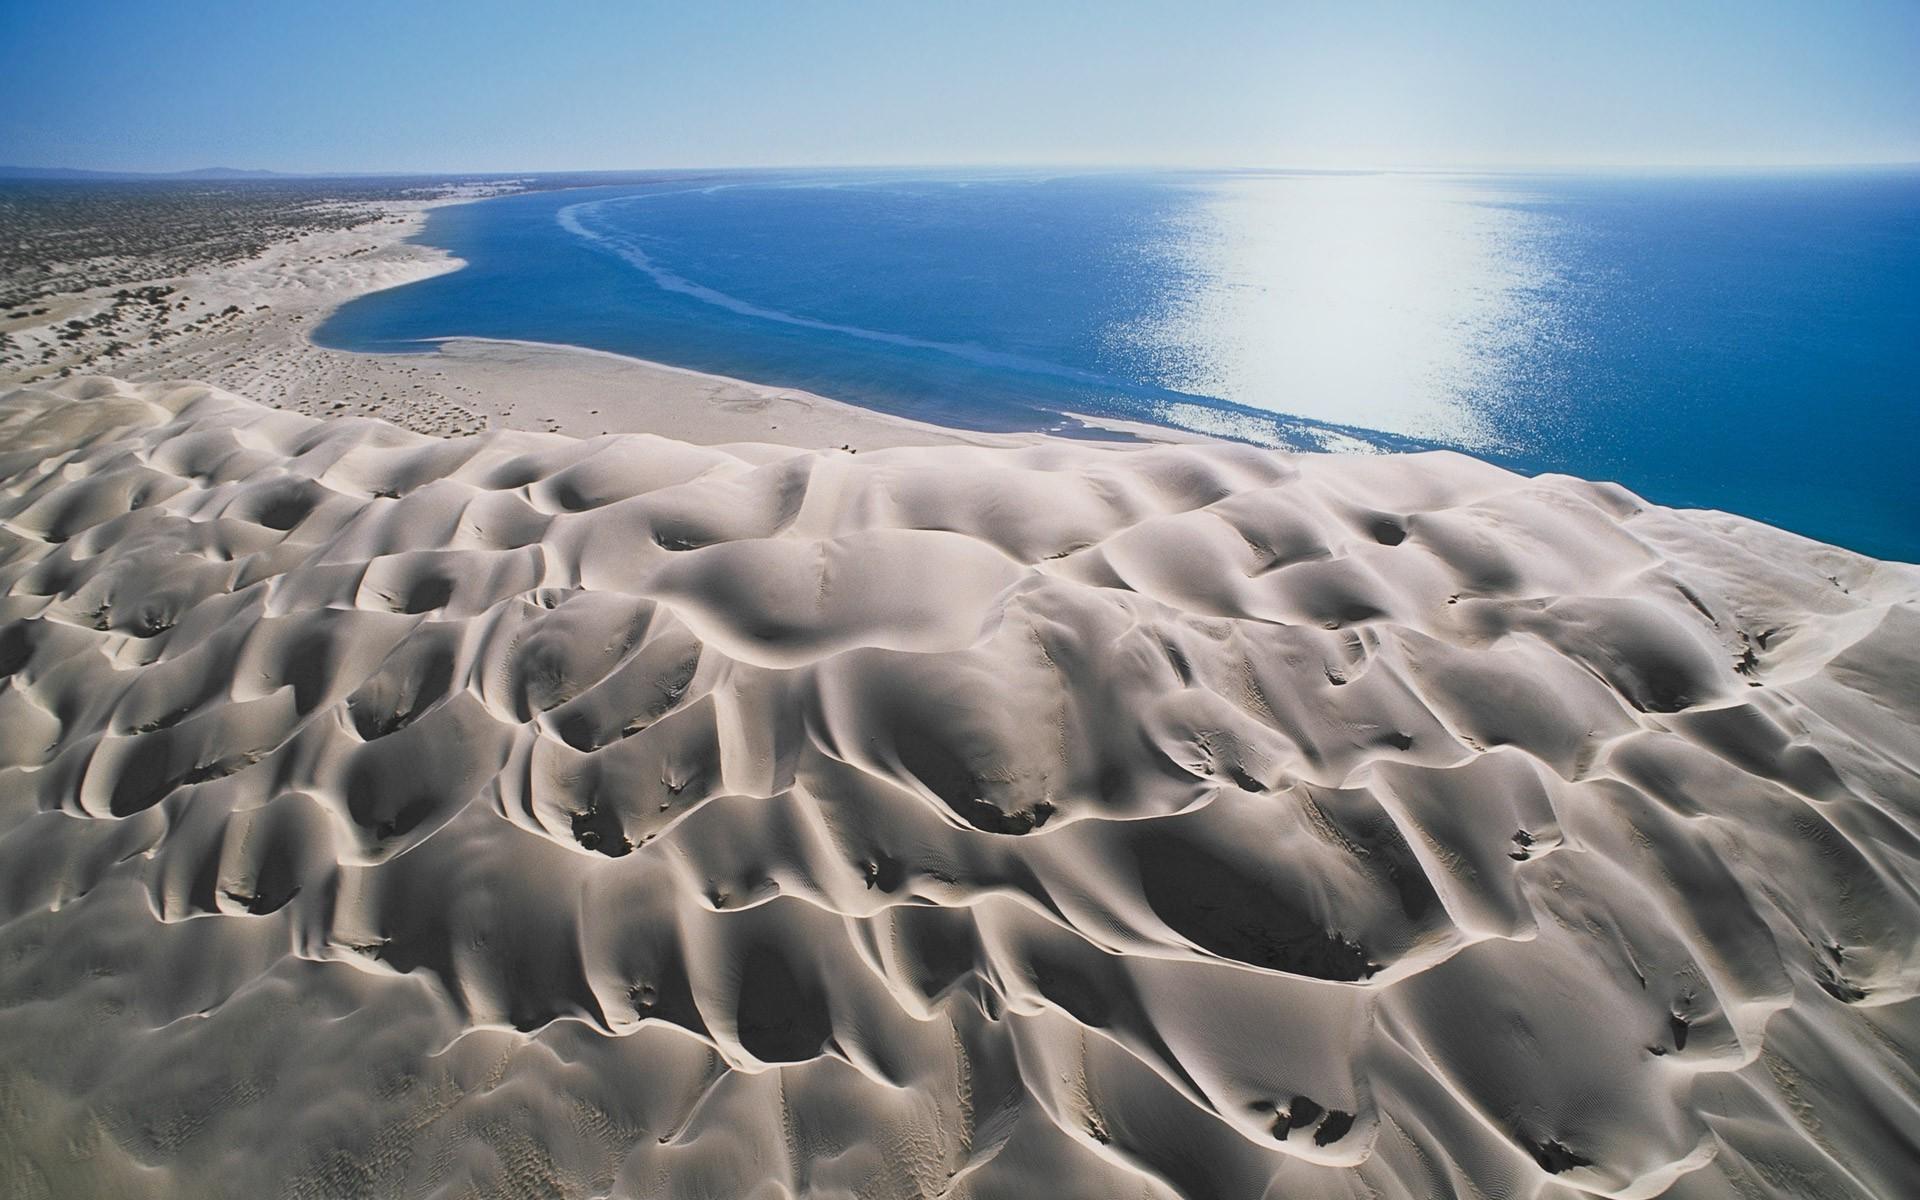 Landscape Sea Water Nature Sand Sky Beach Blue Wind Mexico Erosion Dune Formation Baja California Terrain